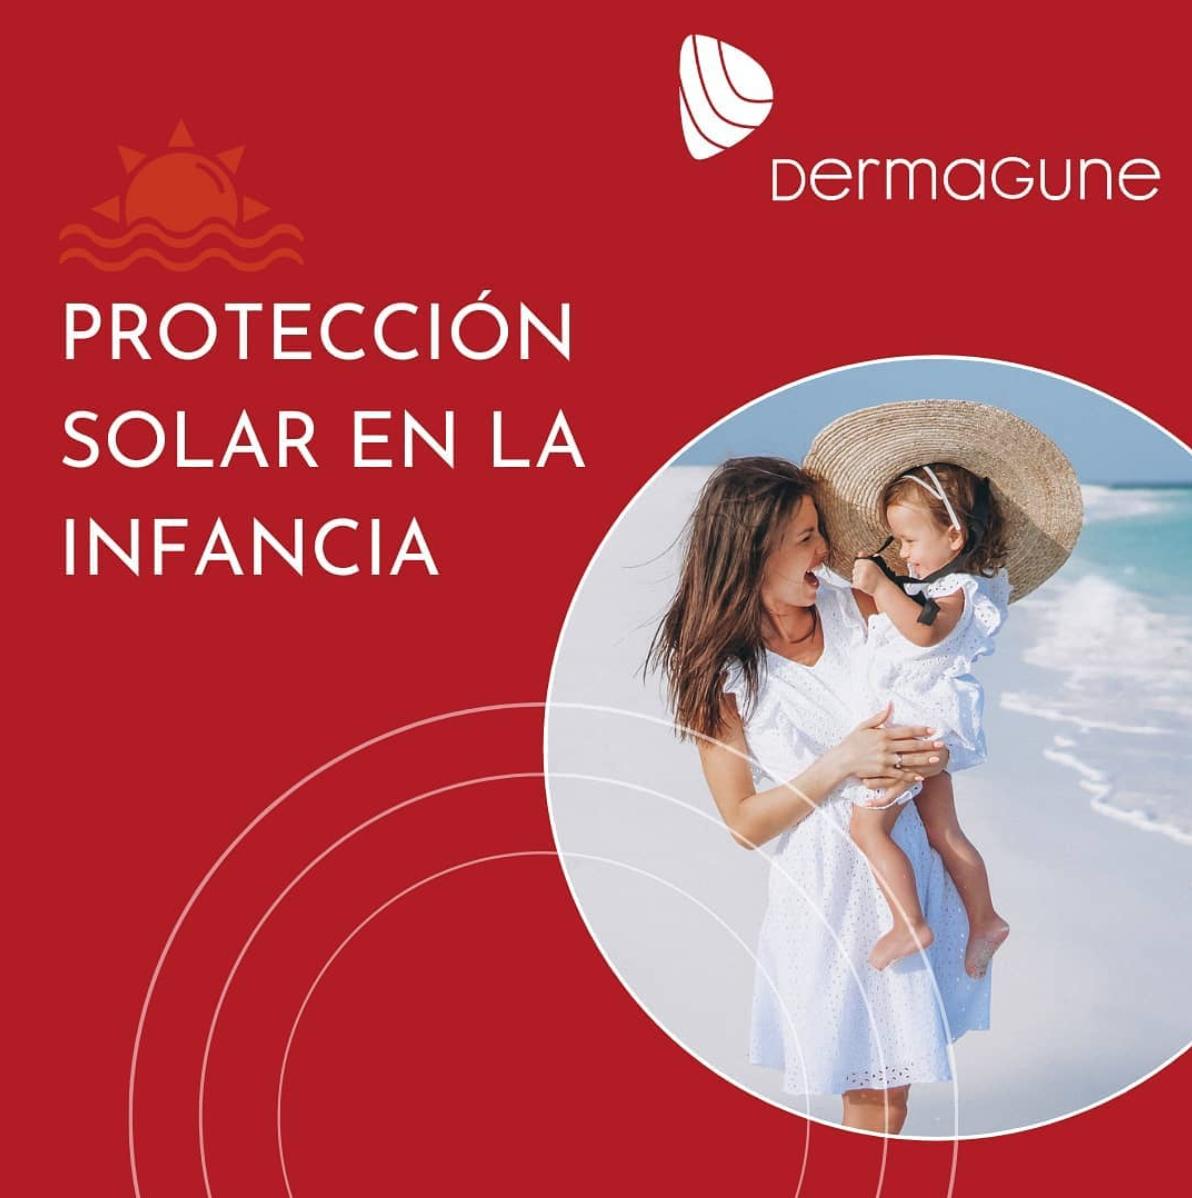 proteccion-solar-infancia.png